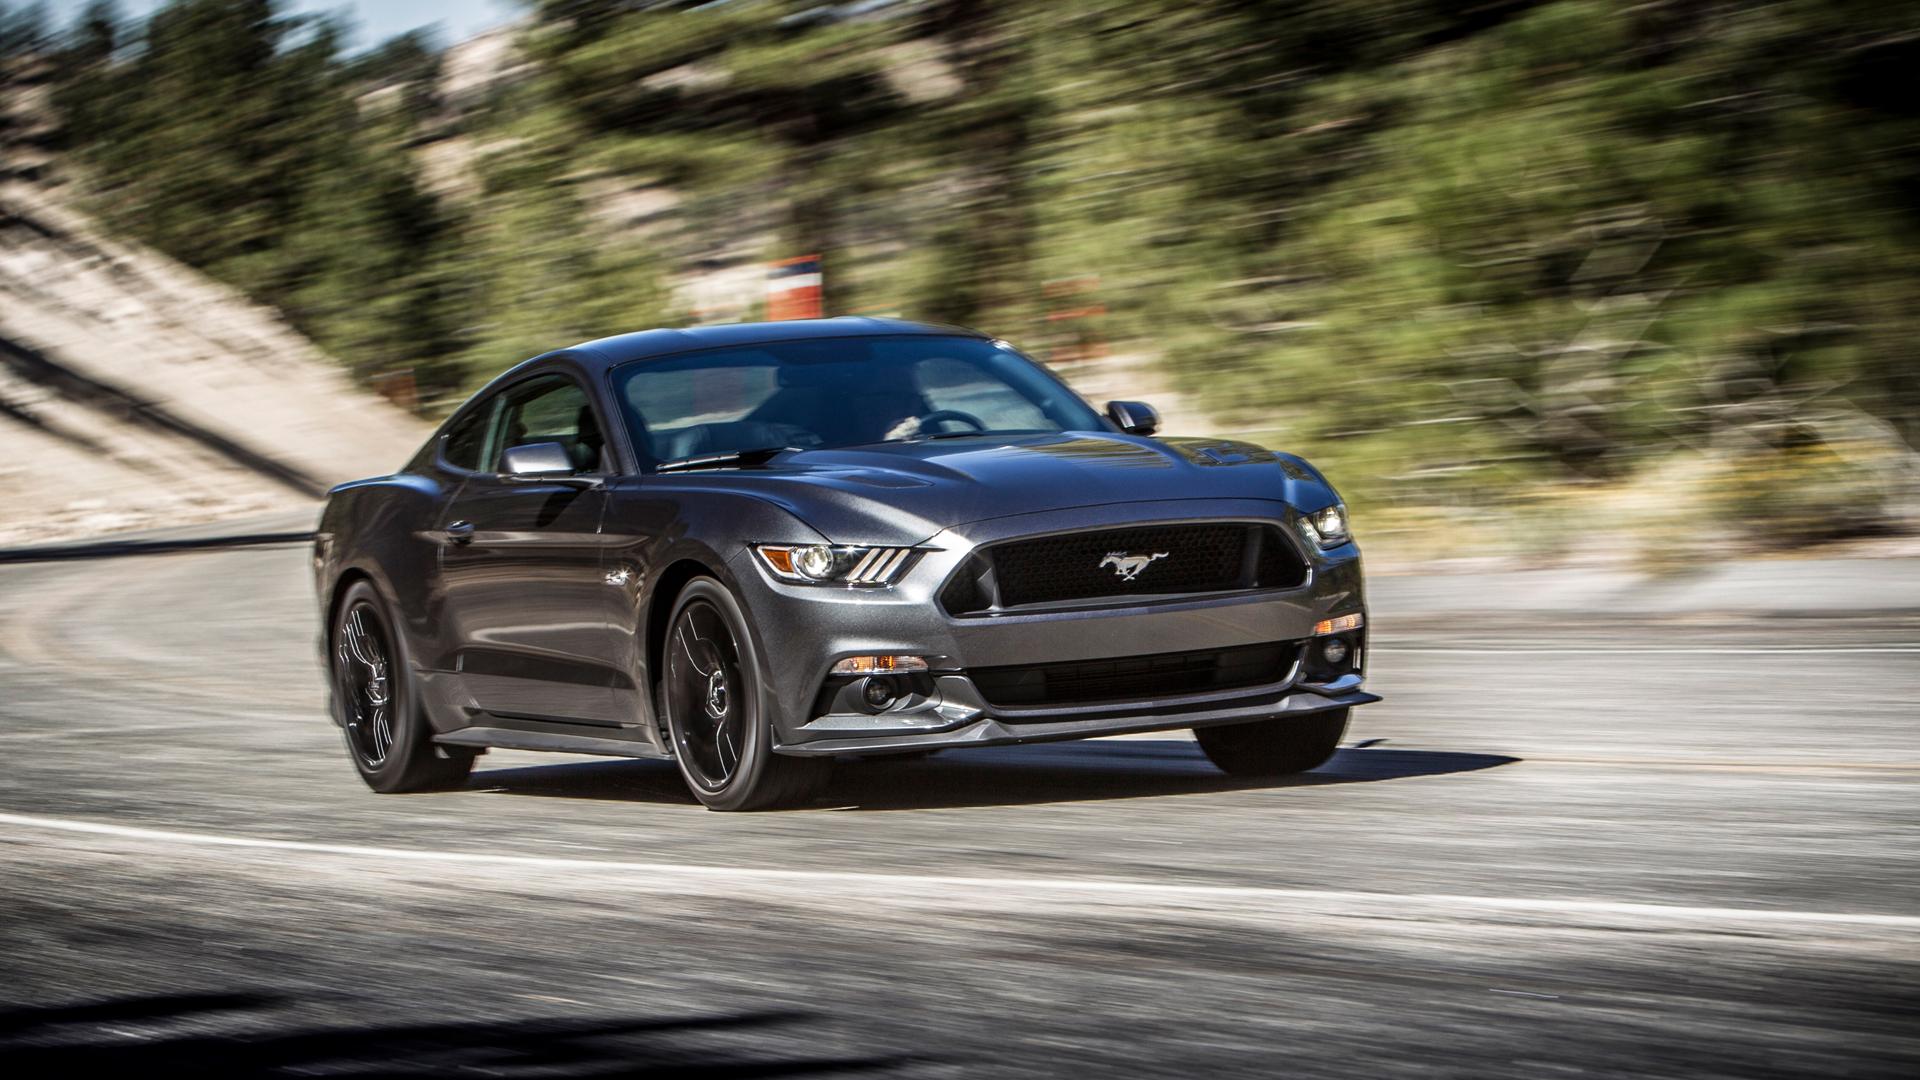 2017 Mustang Shelby Gt350 Black >> Ford Mustang GT Wallpaper HD - WallpaperSafari